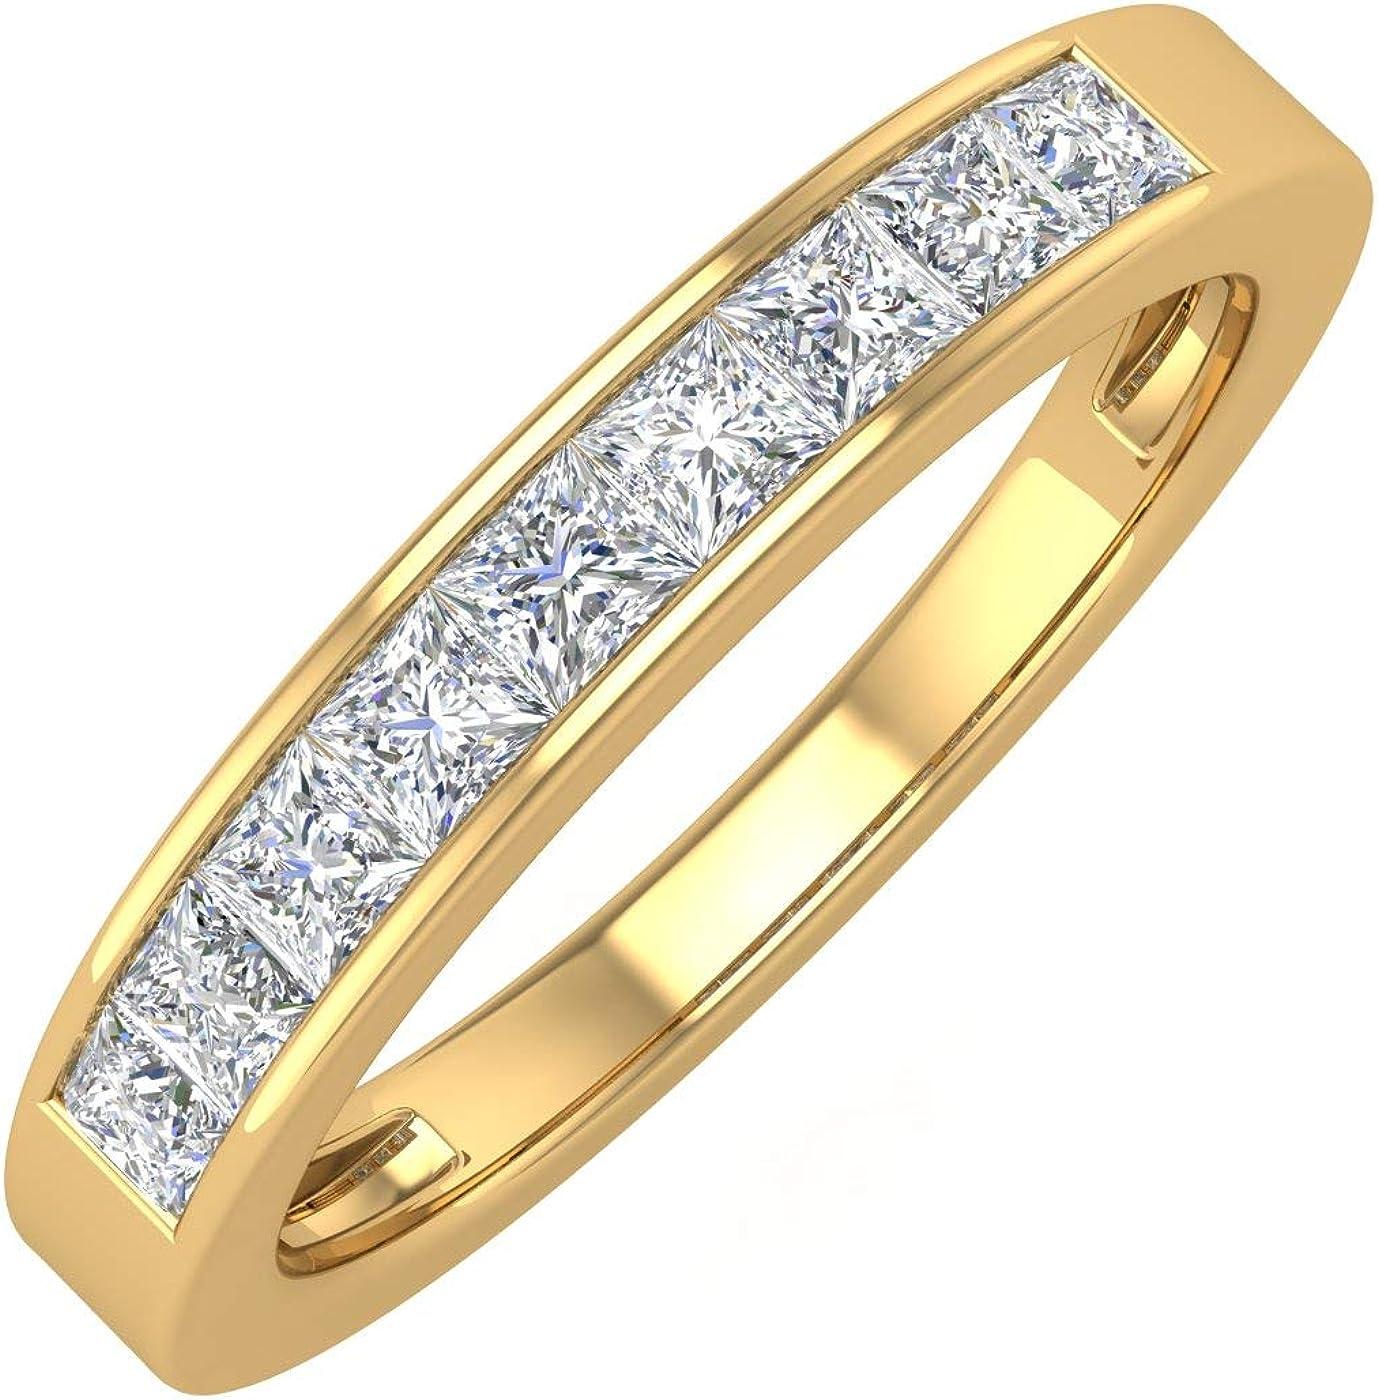 1/2 Carat Channel Set Princess Cut Diamond Wedding Band Ring in 14K Gold